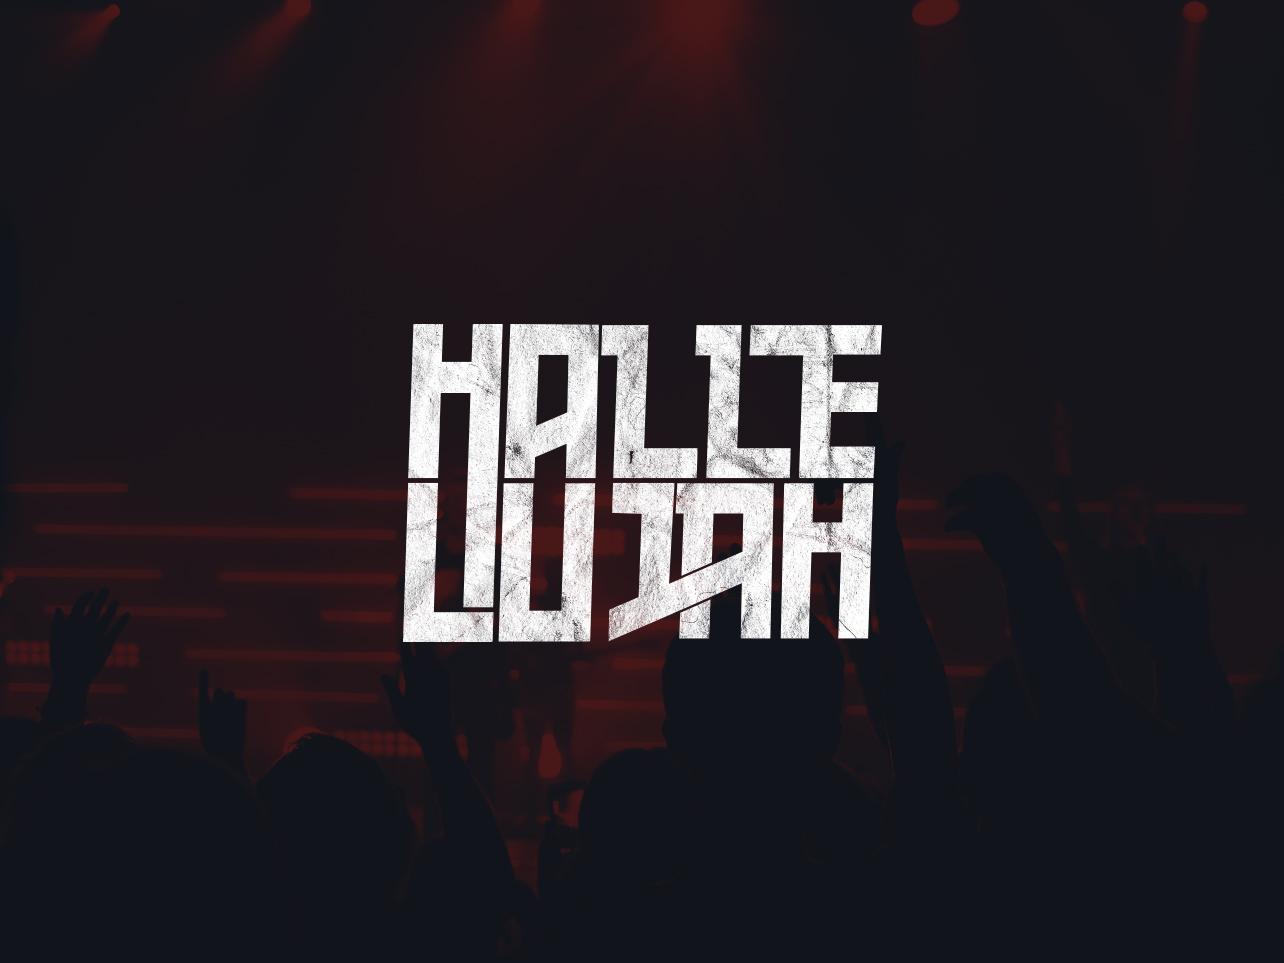 Hallelujah Logo designart custom font hallelujah logo church logo logo branding hallelujah typeography customlettering church graphic logo design church branding illustrator